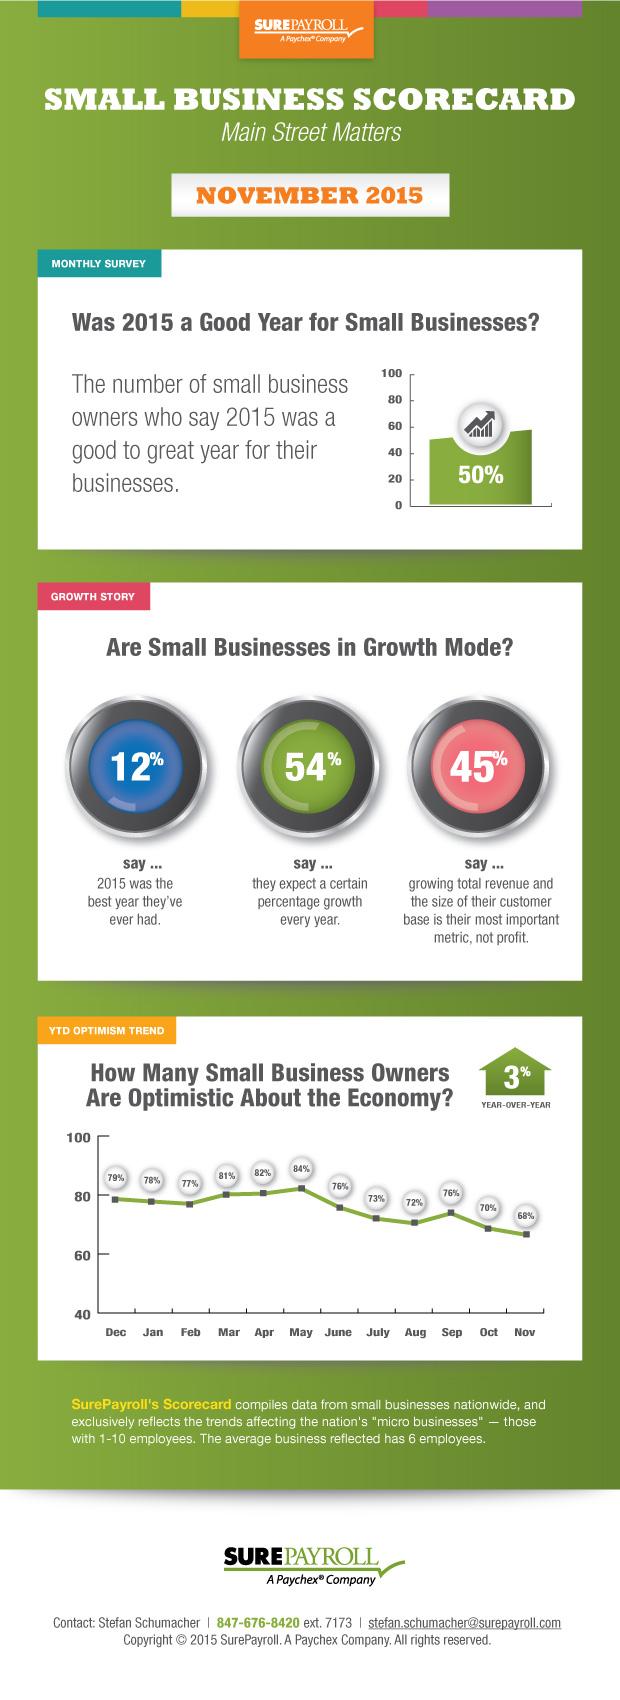 surepayroll small business scorecard november 2015